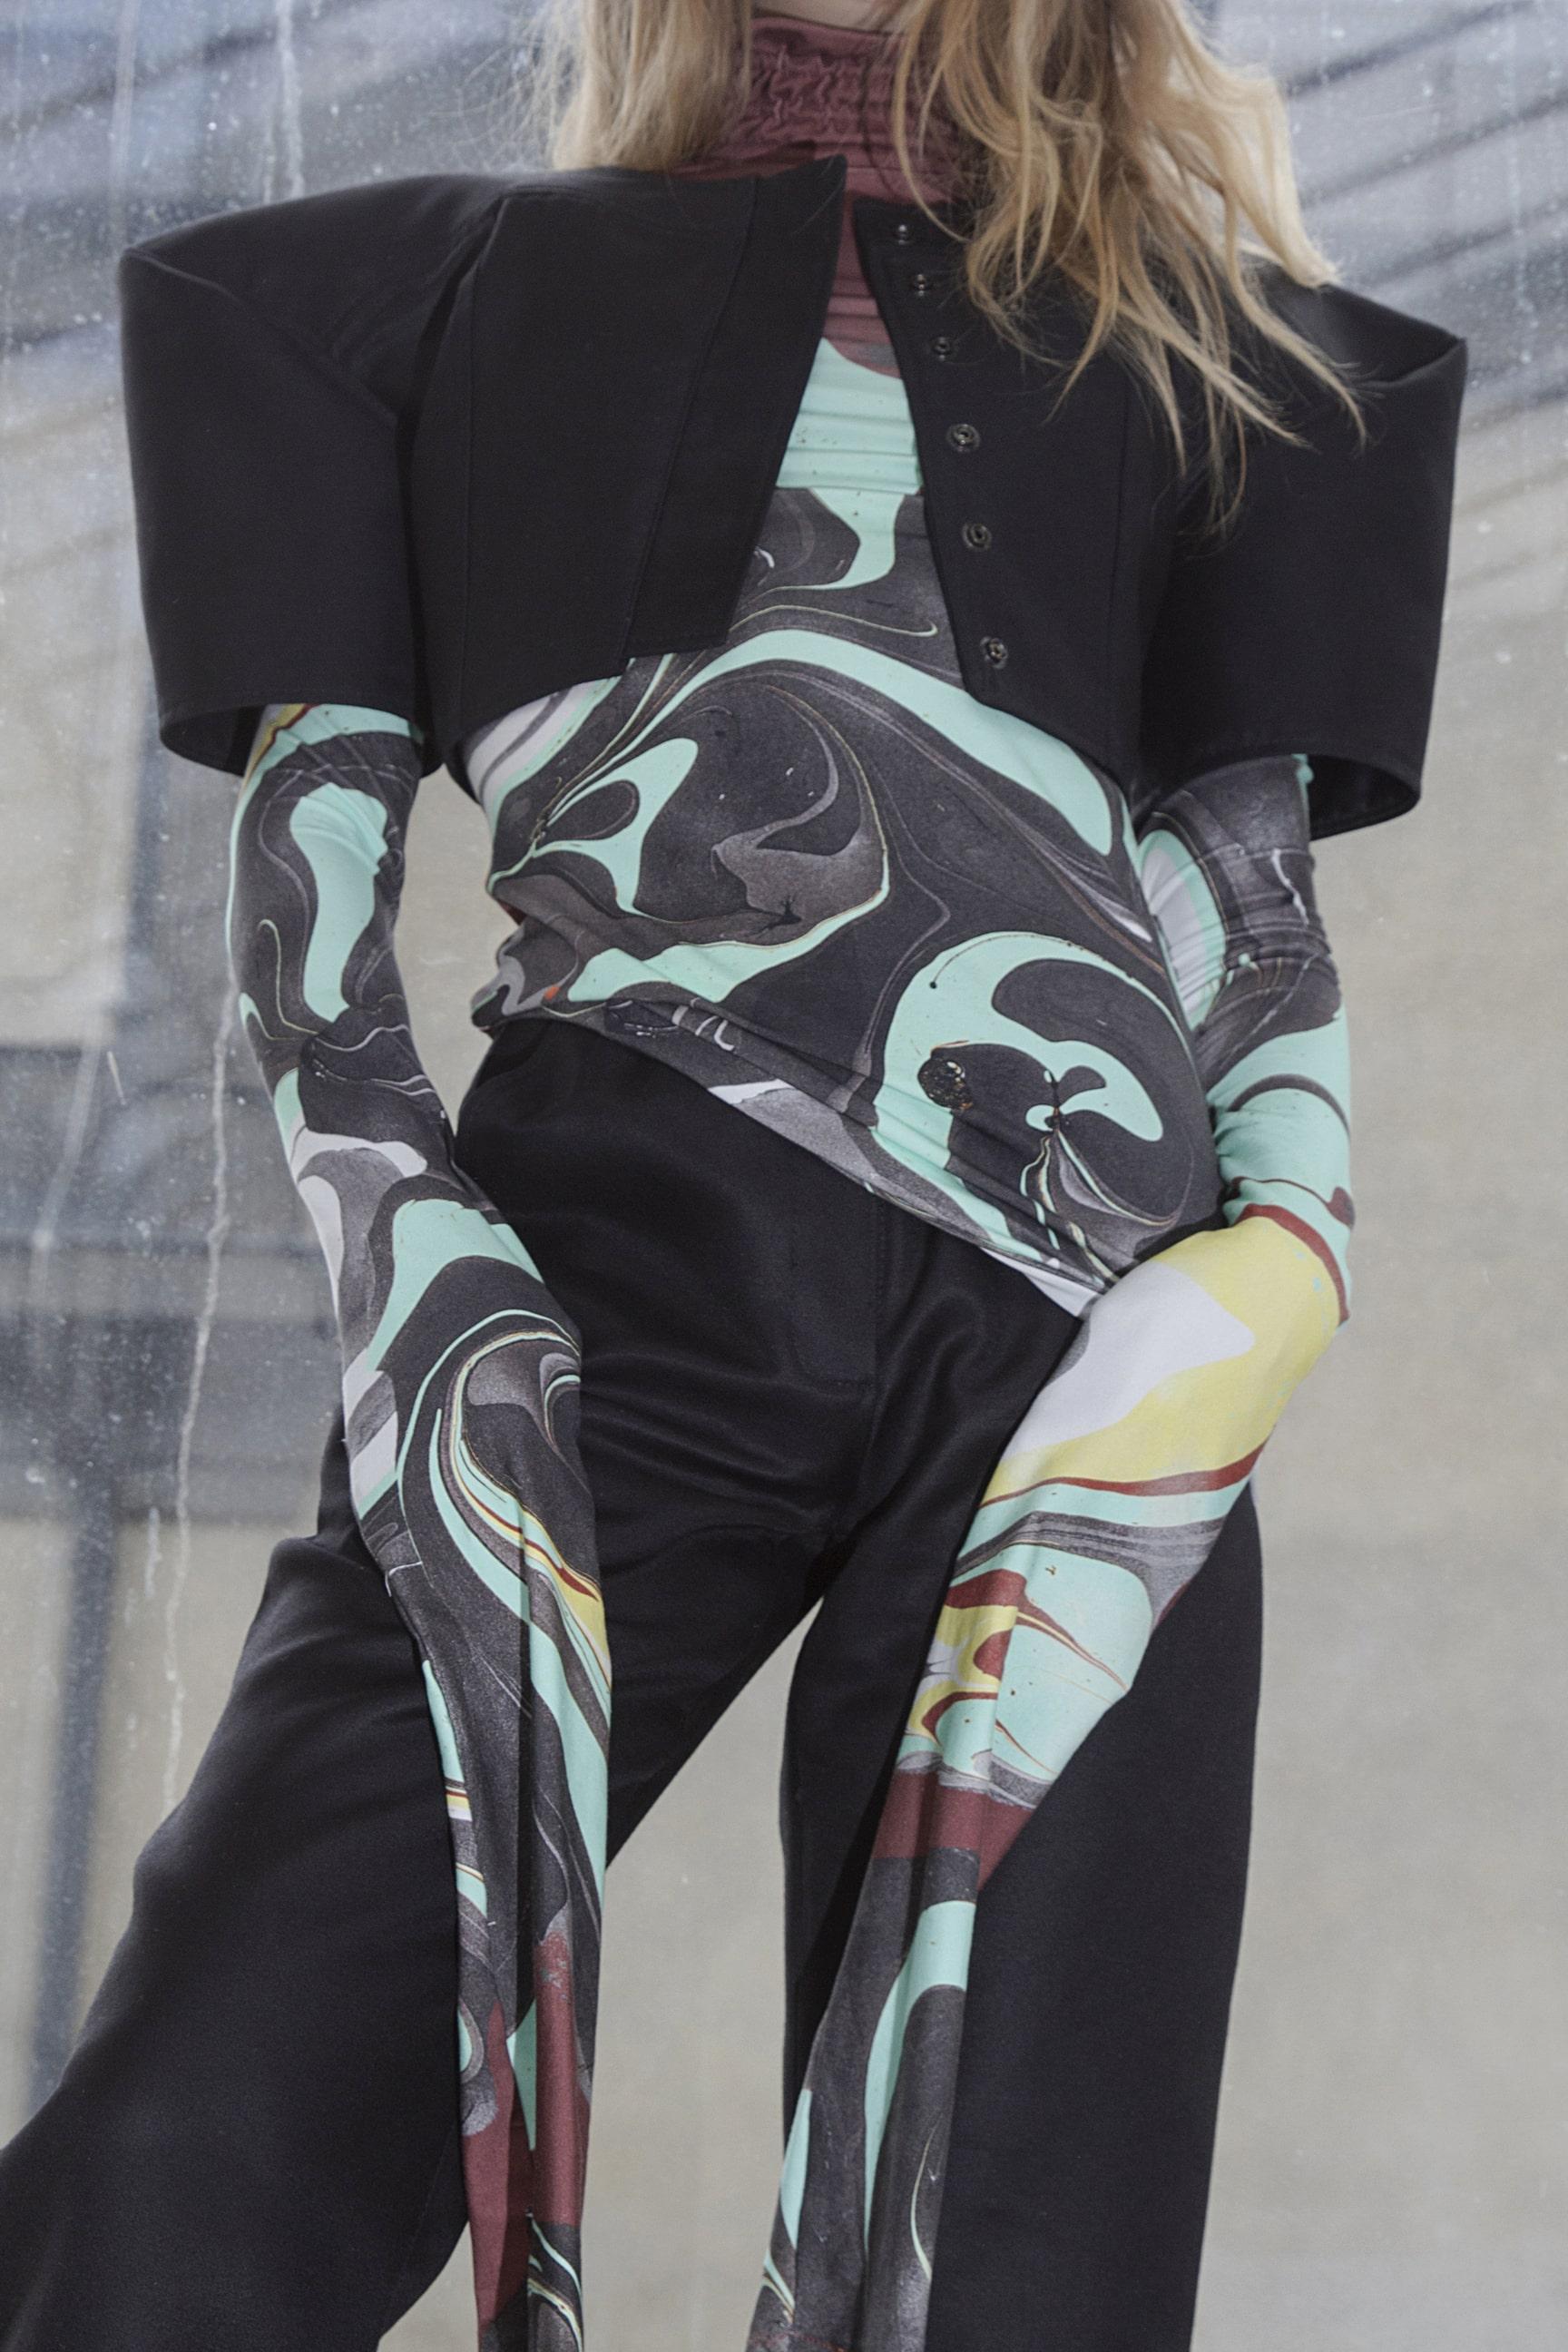 taja-virvar-artist-photographer-fashion-editorial-magazine